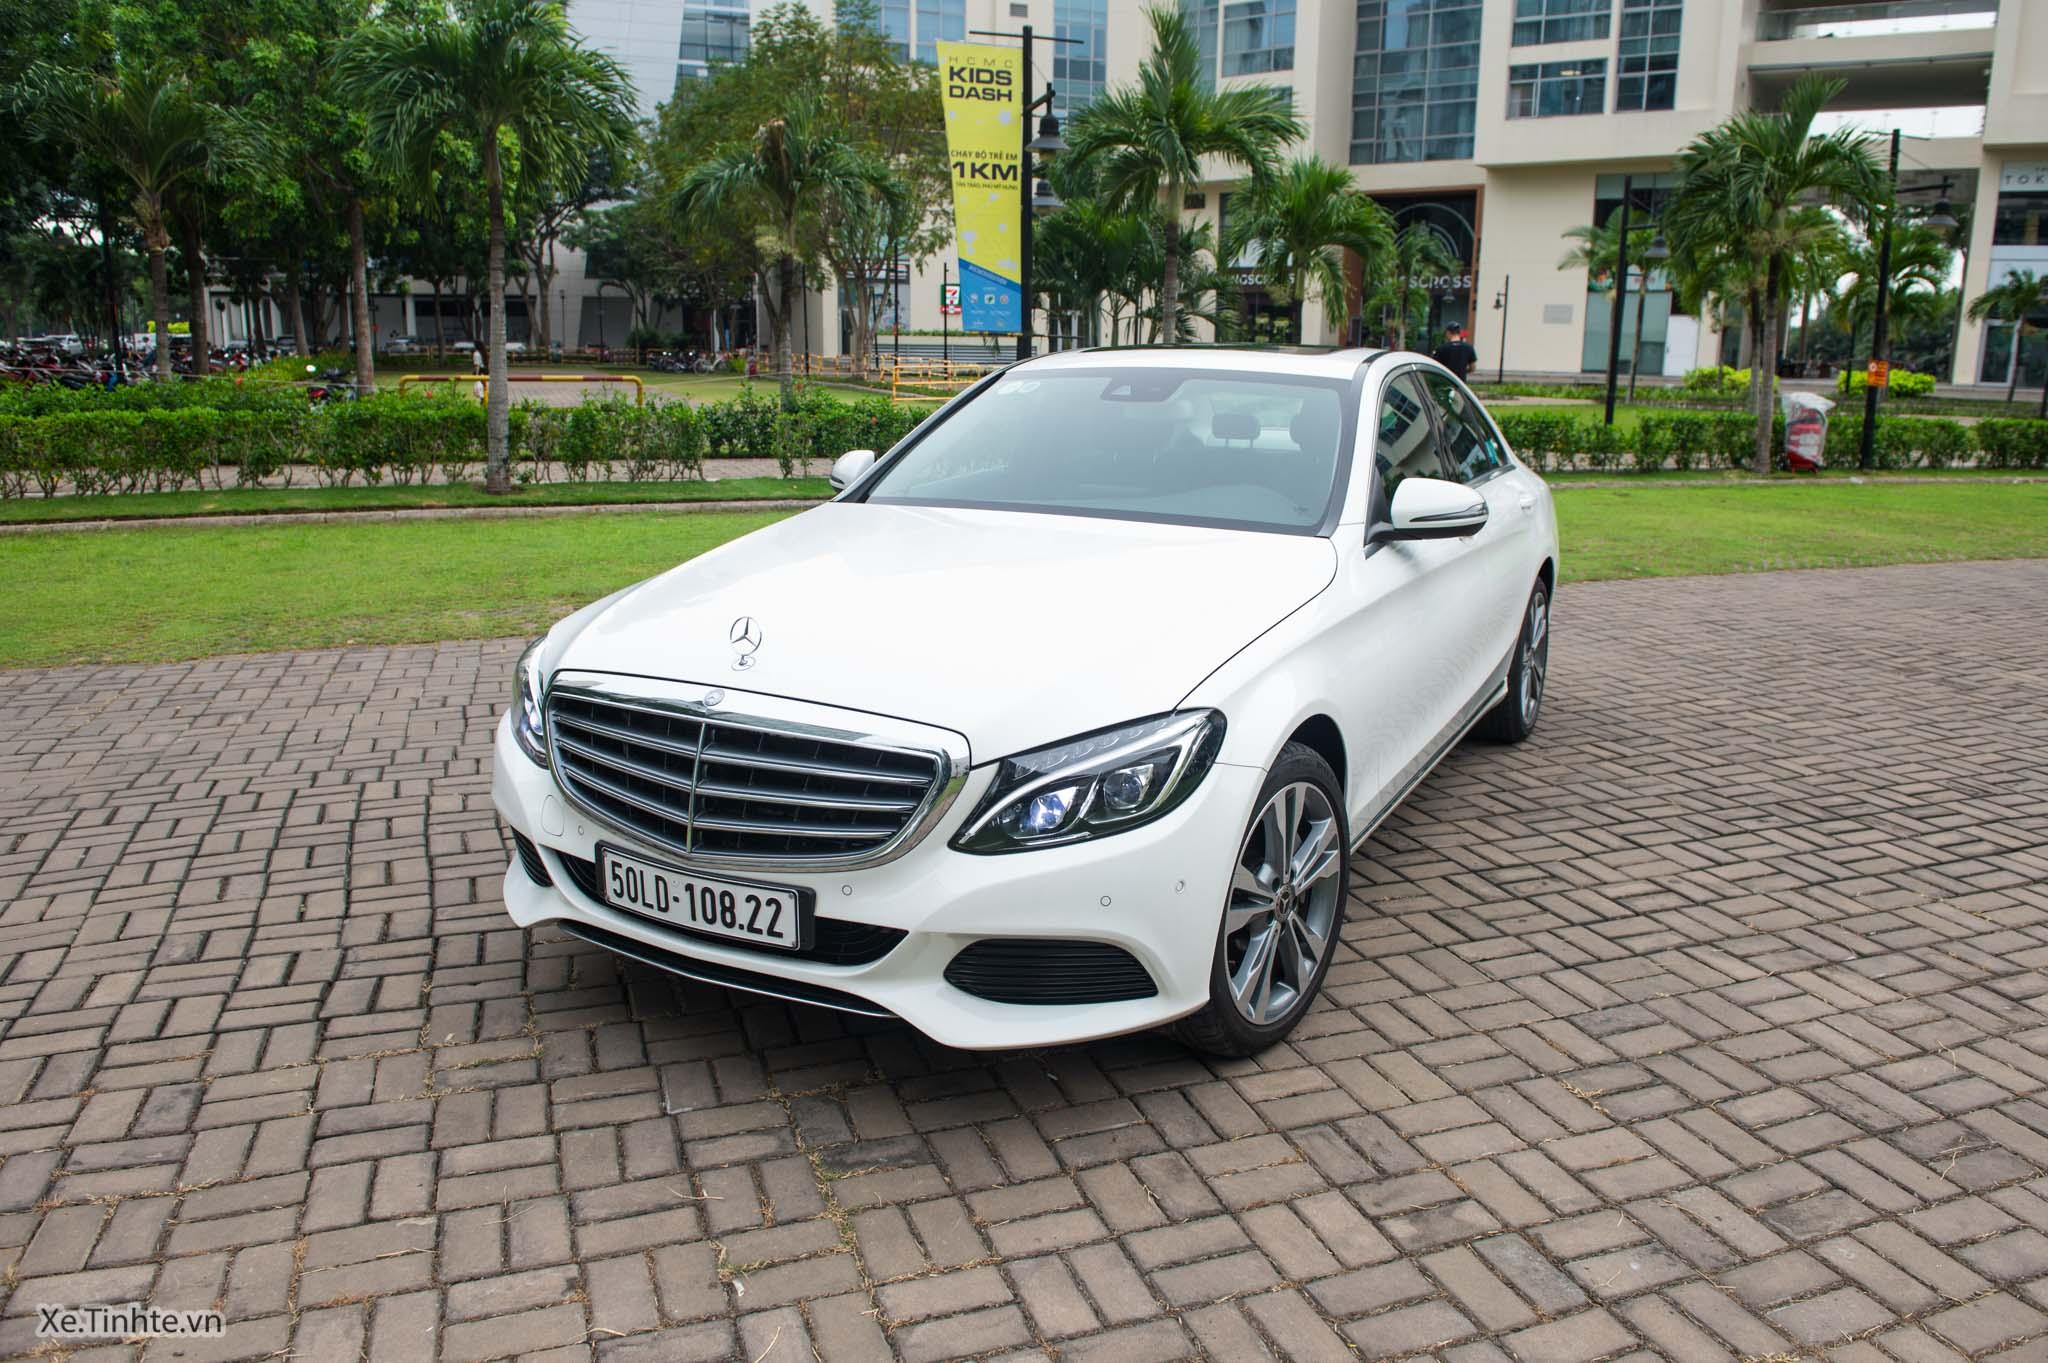 Mercedes_C250 Exclusive_Xe.tinhte.vn-7065.jpg